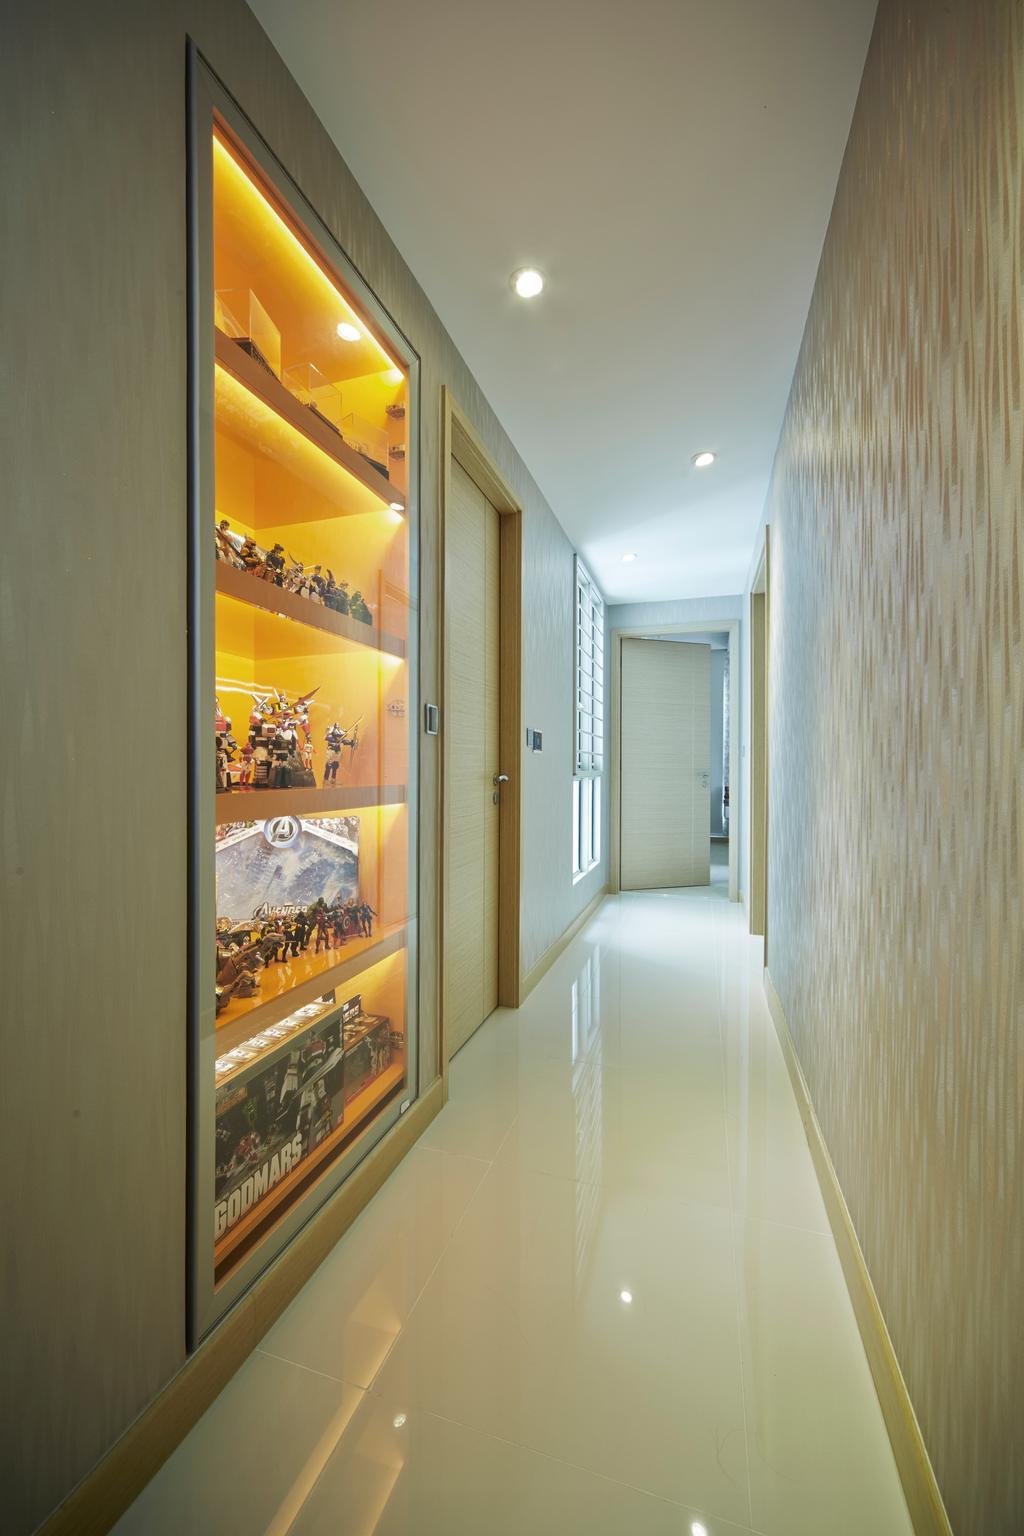 Transitional, Condo, Tree House, Interior Designer, Carpenters 匠, Corridor, Walkway, Hallway, Display, Display Cabinet, Collectibles, Figurine, Figurines, Toys, Flooring